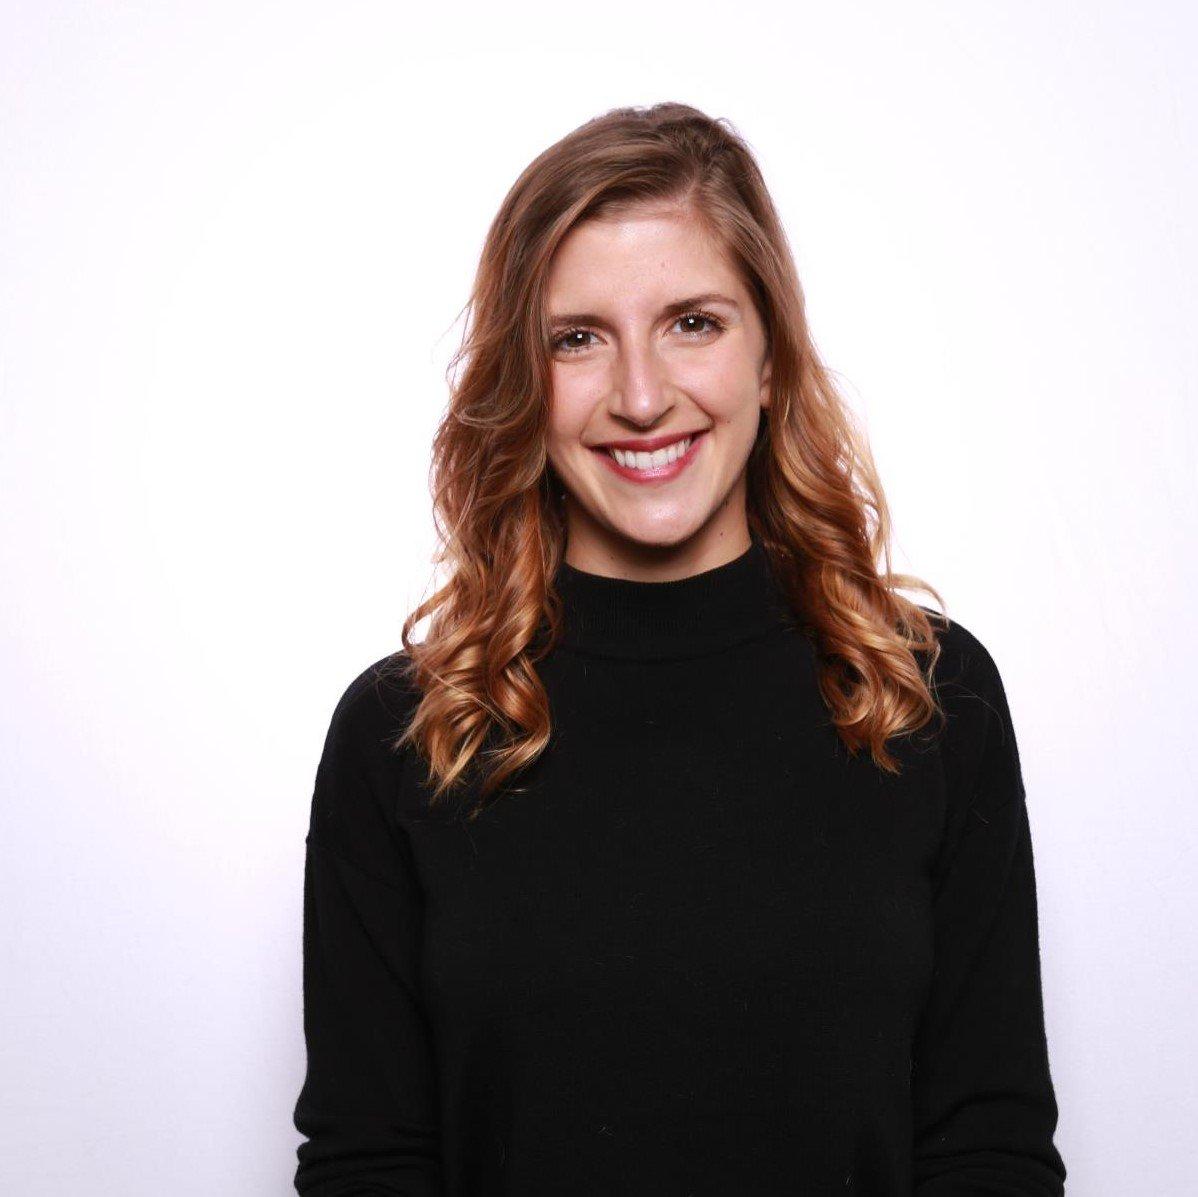 Julie Leclercq